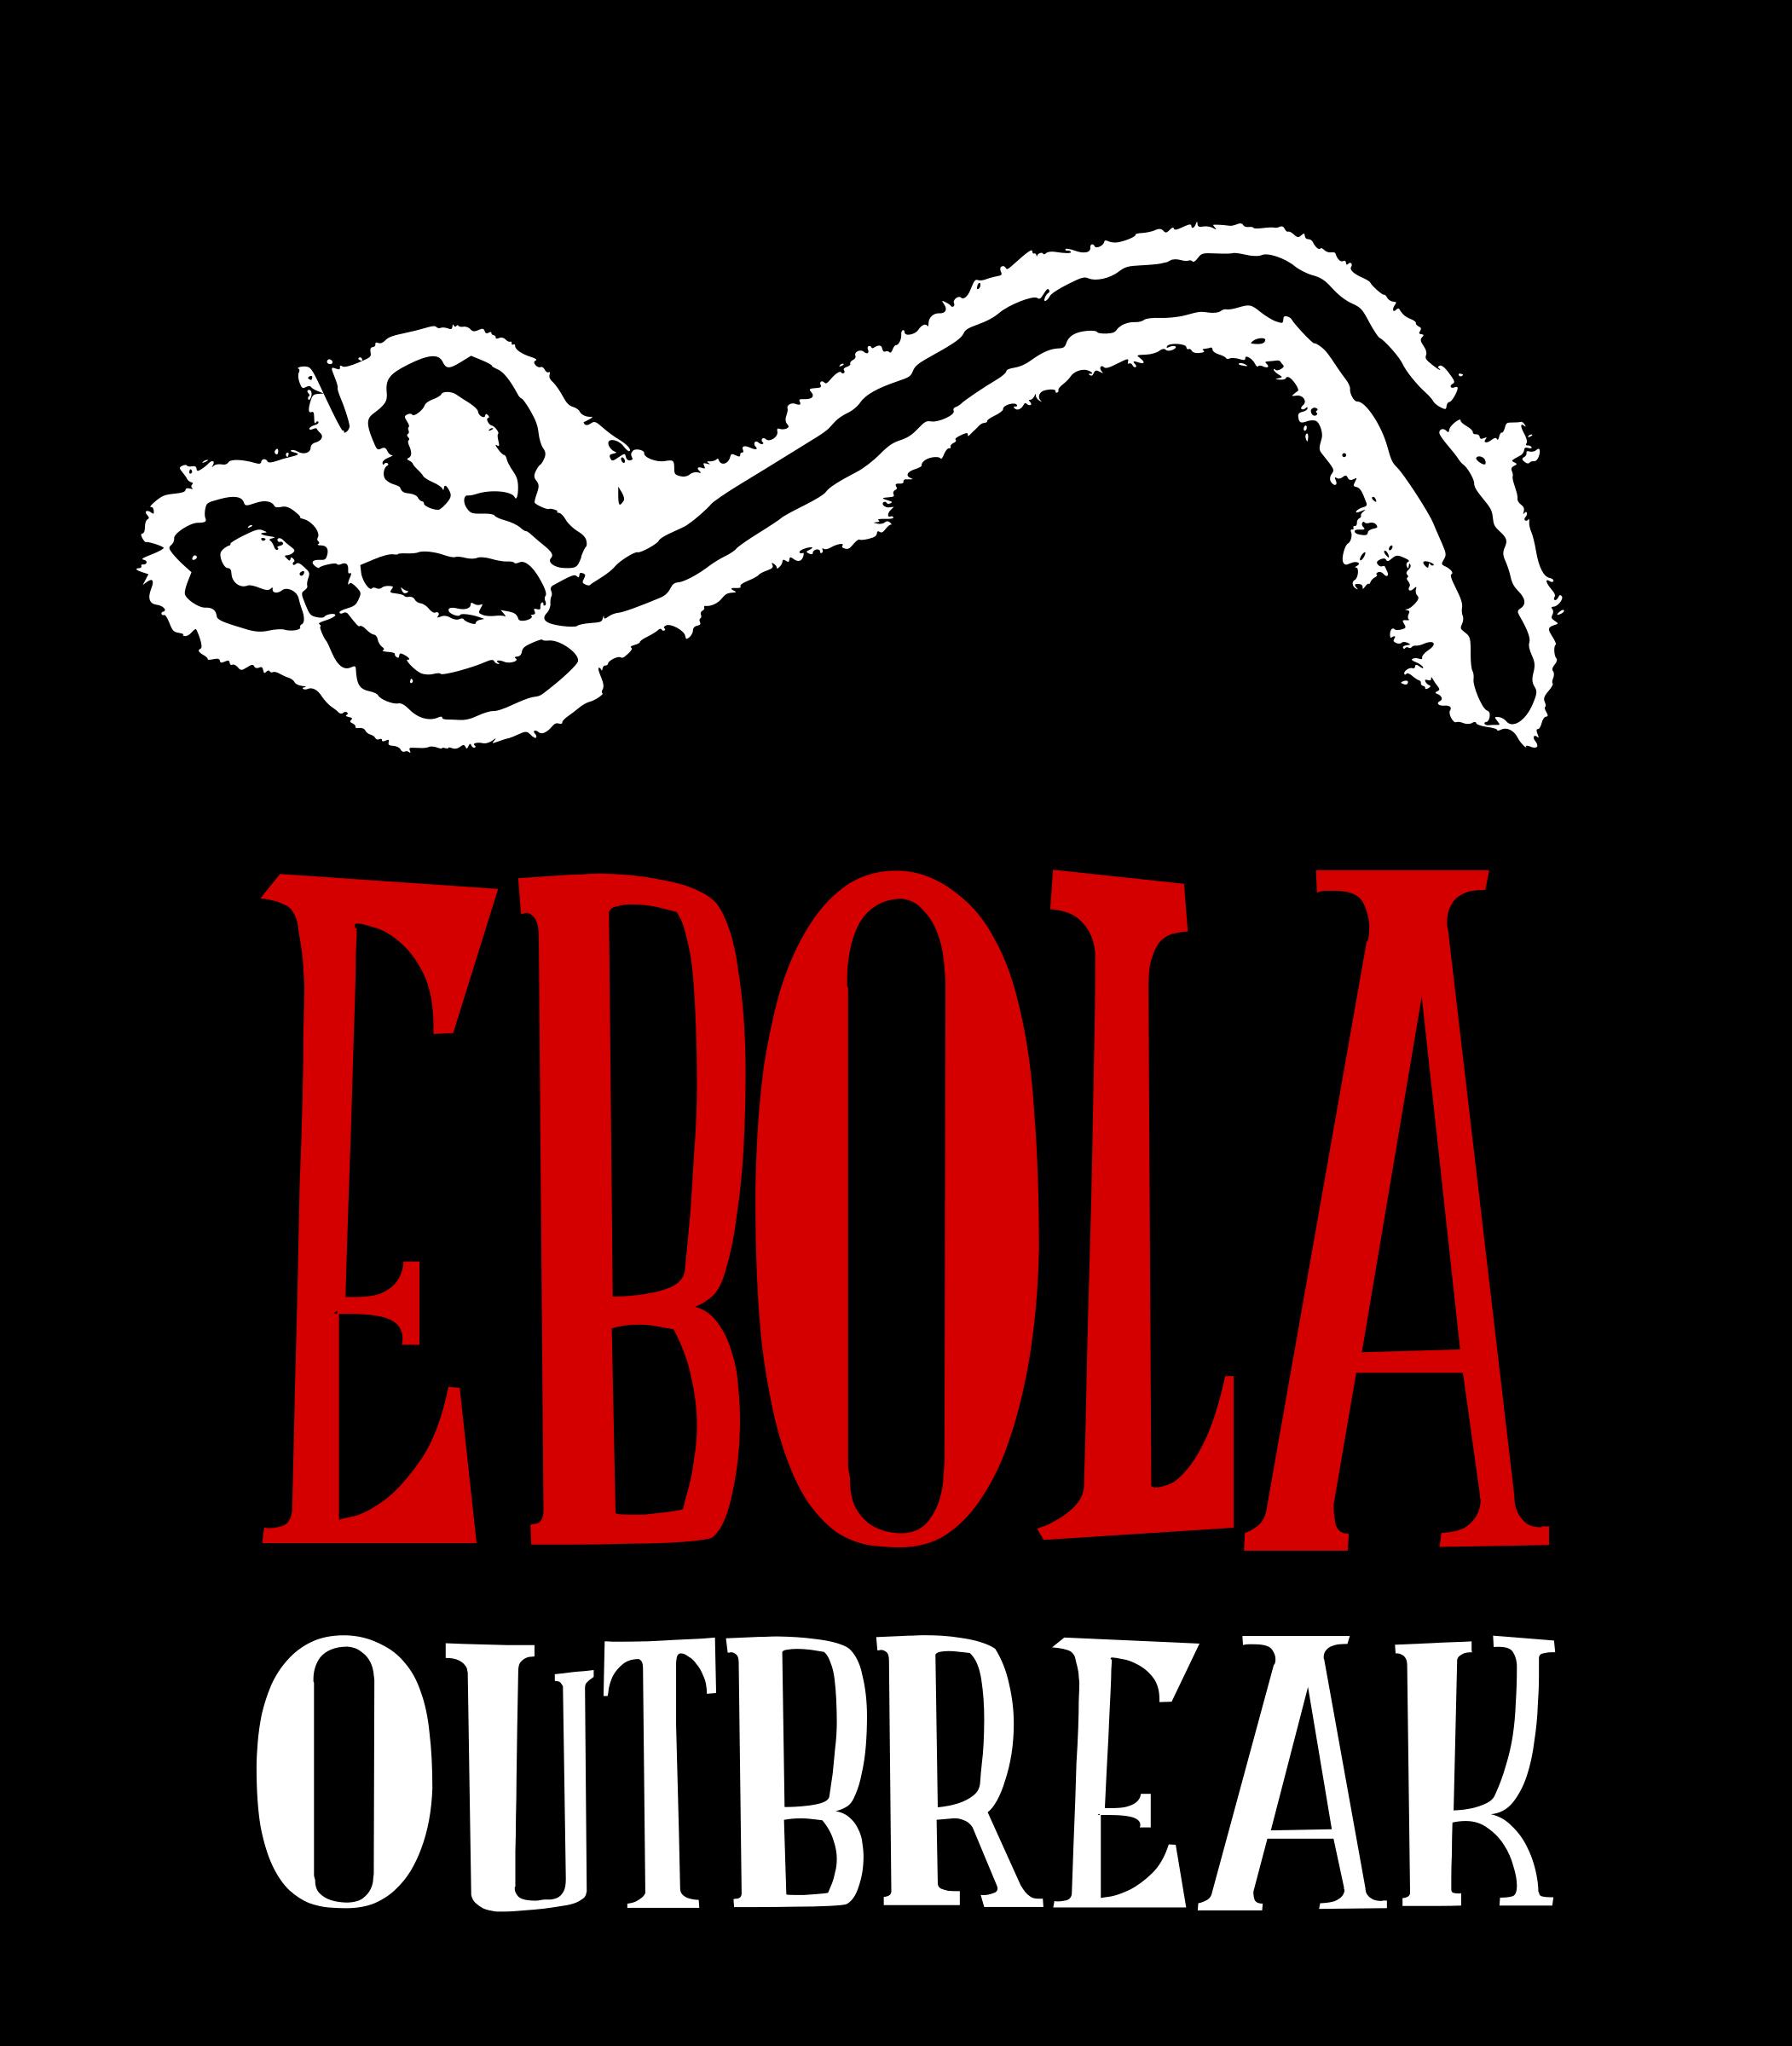 Pictures virus ebola